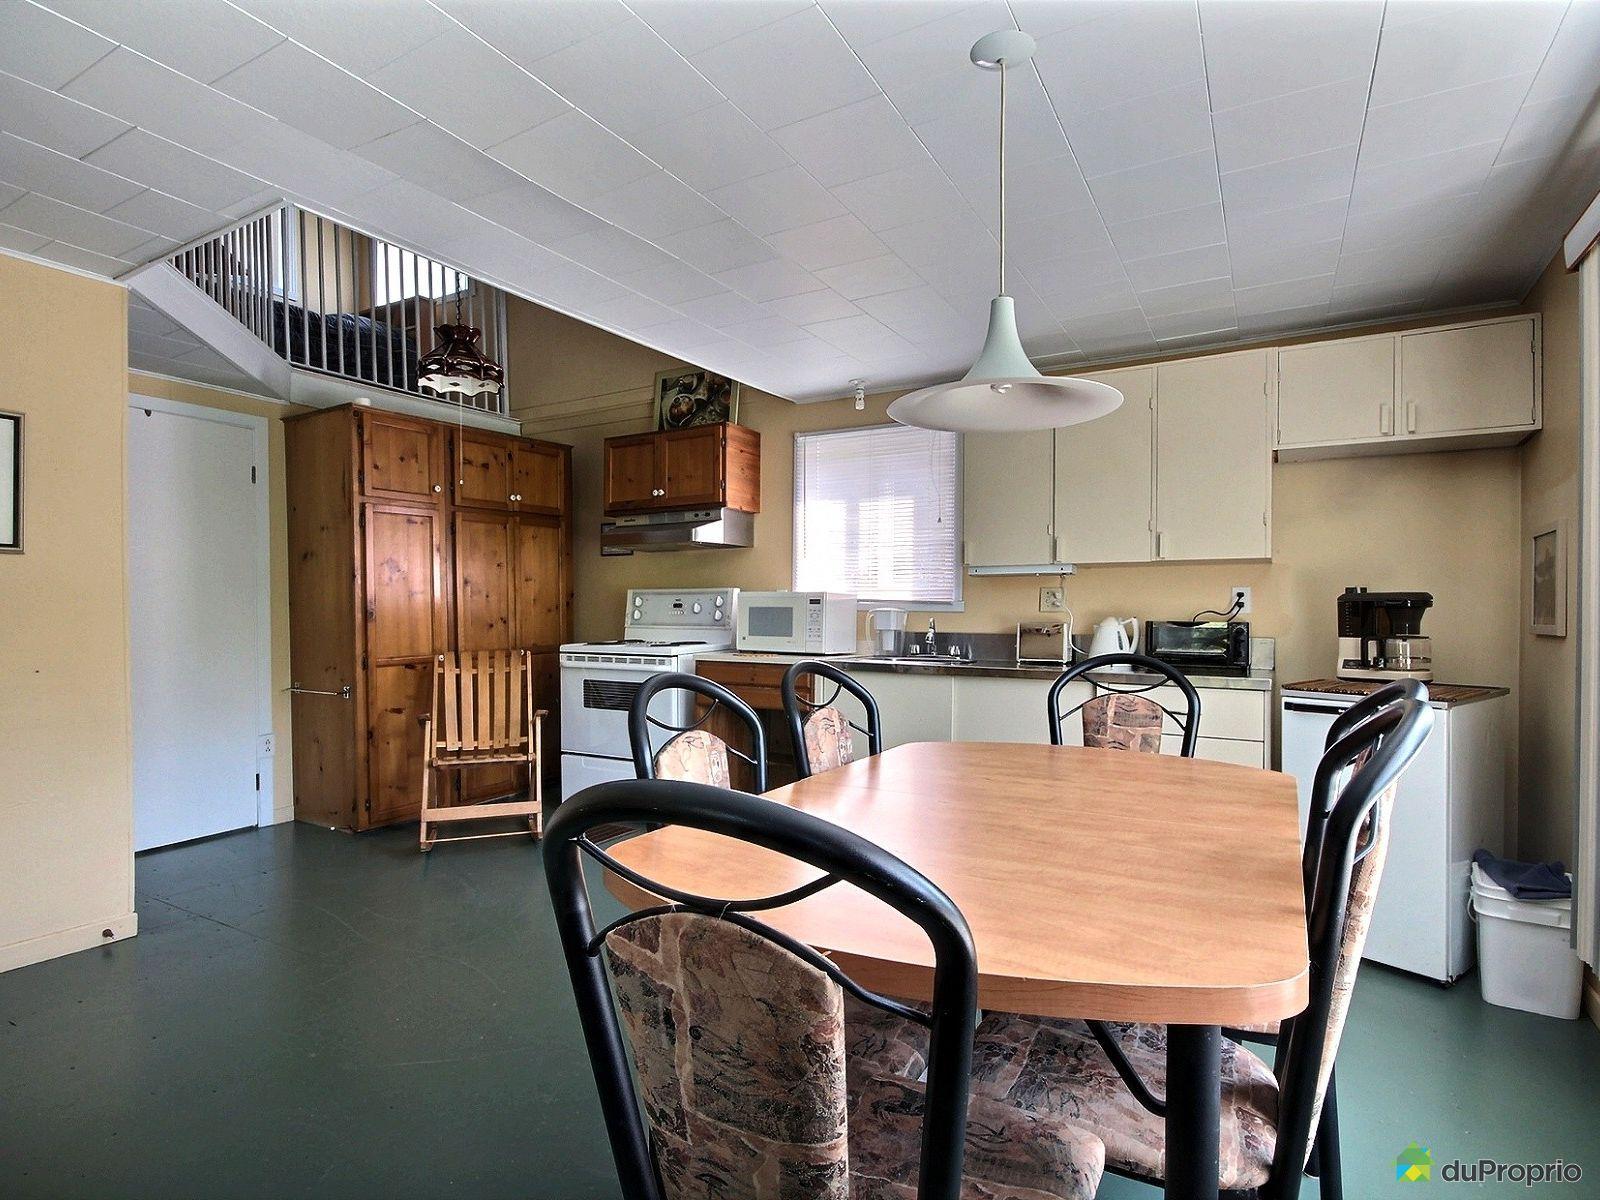 maison vendre st l on le grand 34 route 195 immobilier qu bec duproprio 706781. Black Bedroom Furniture Sets. Home Design Ideas